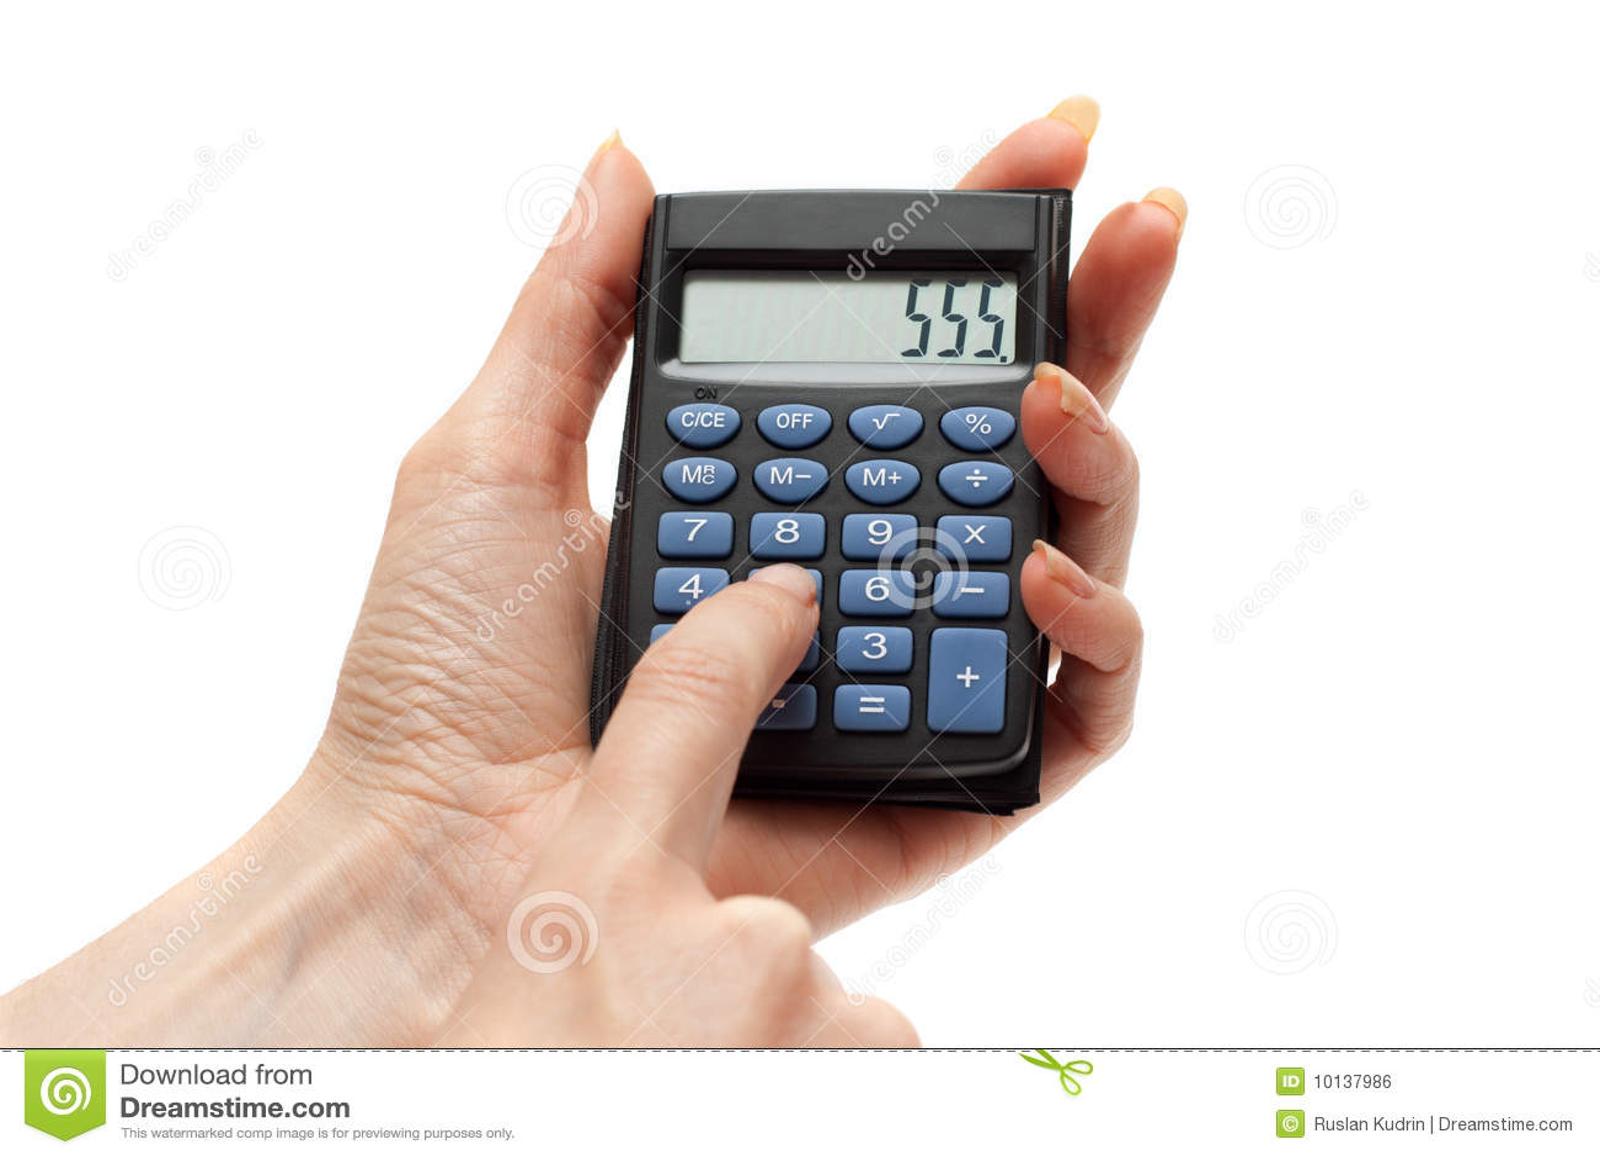 555 Timer Design Calculator Software